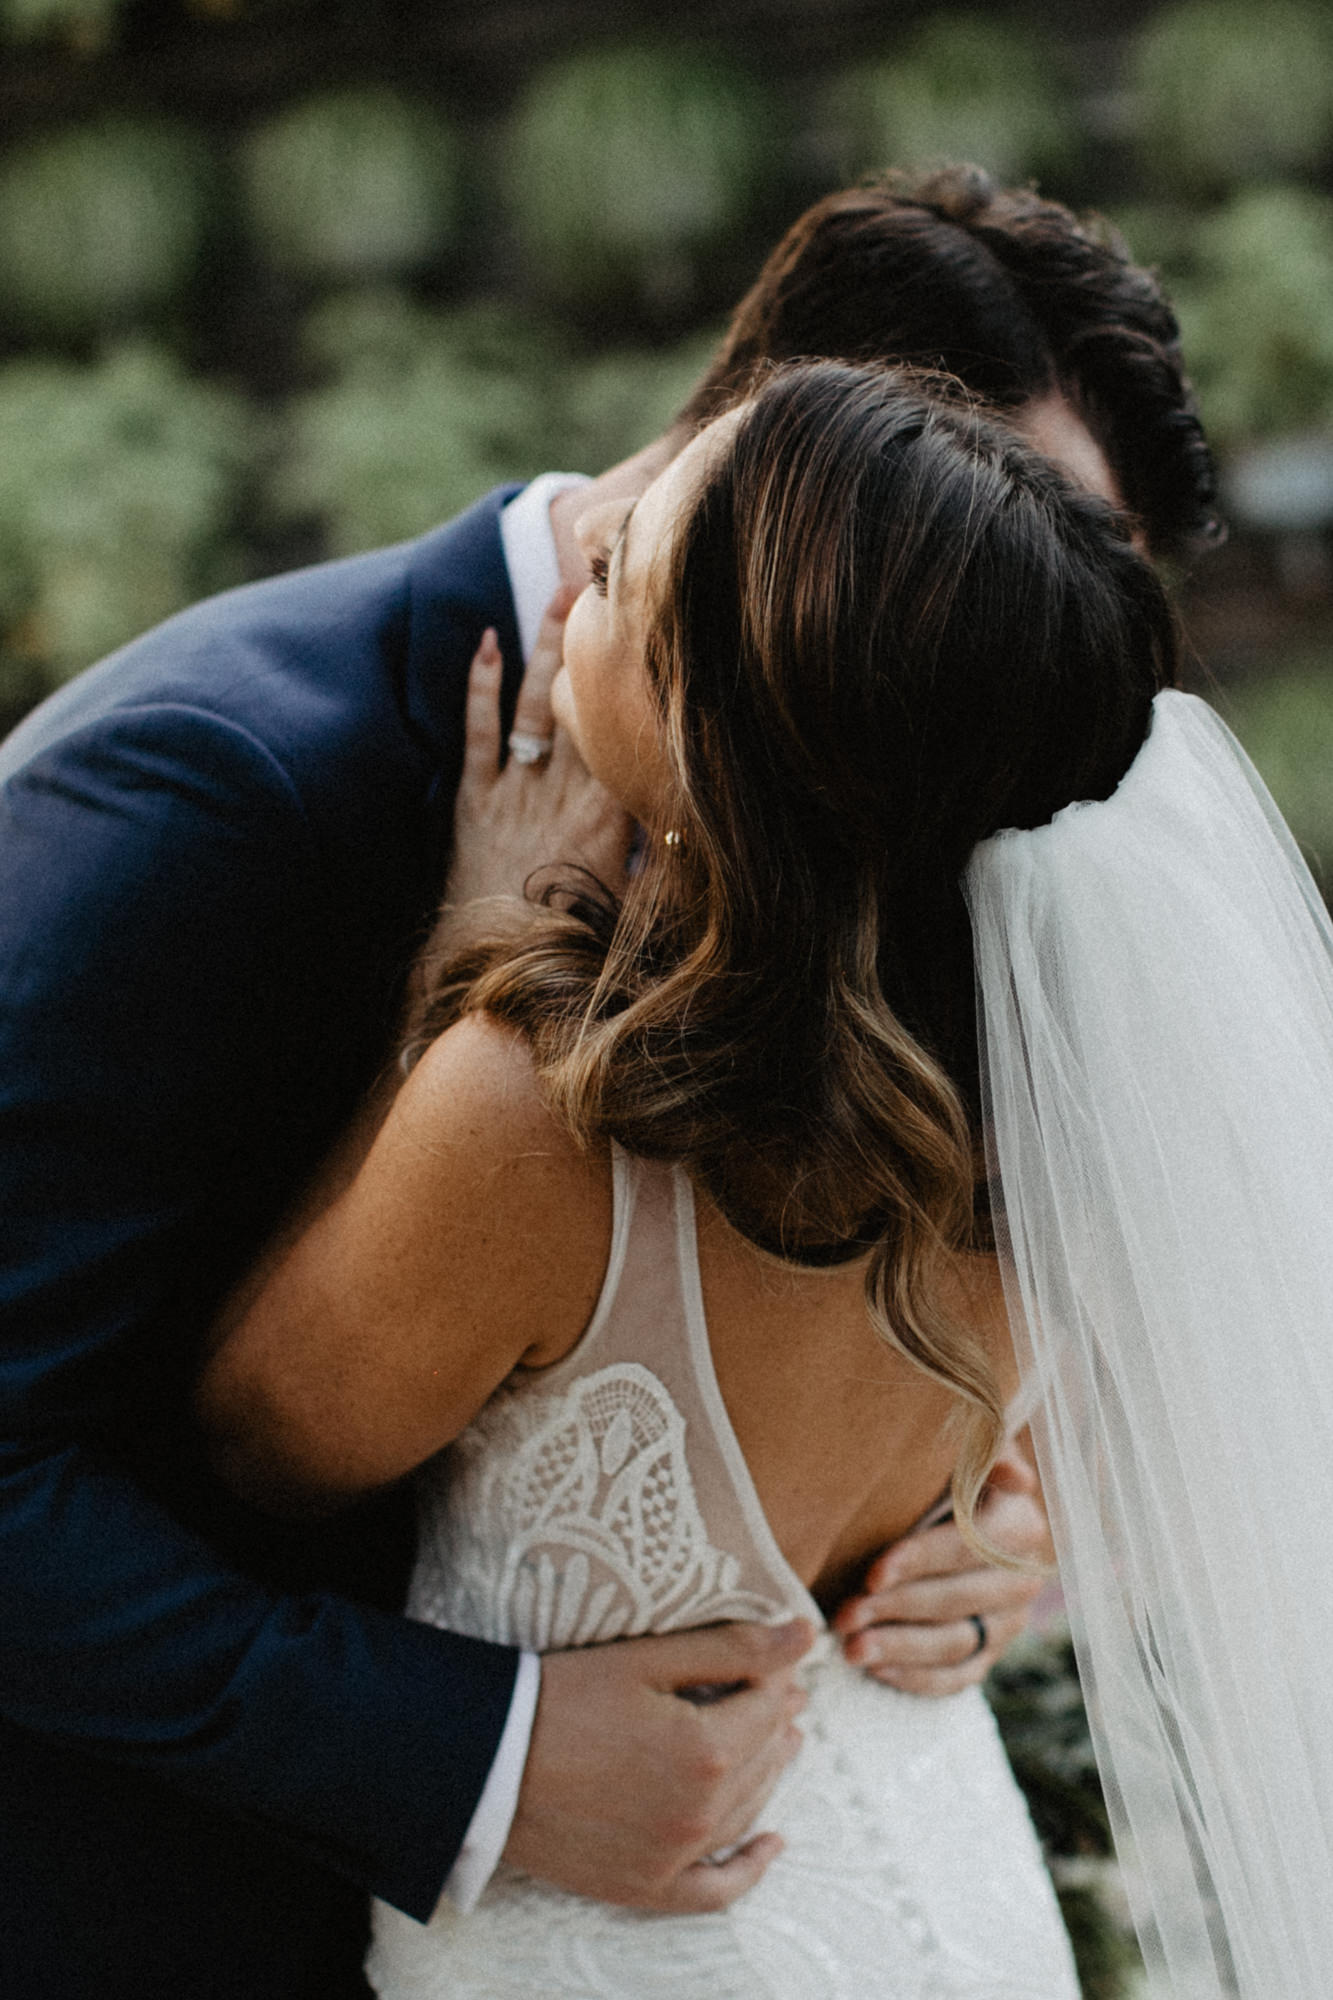 terrain-events-wedding-photographer-45.jpg